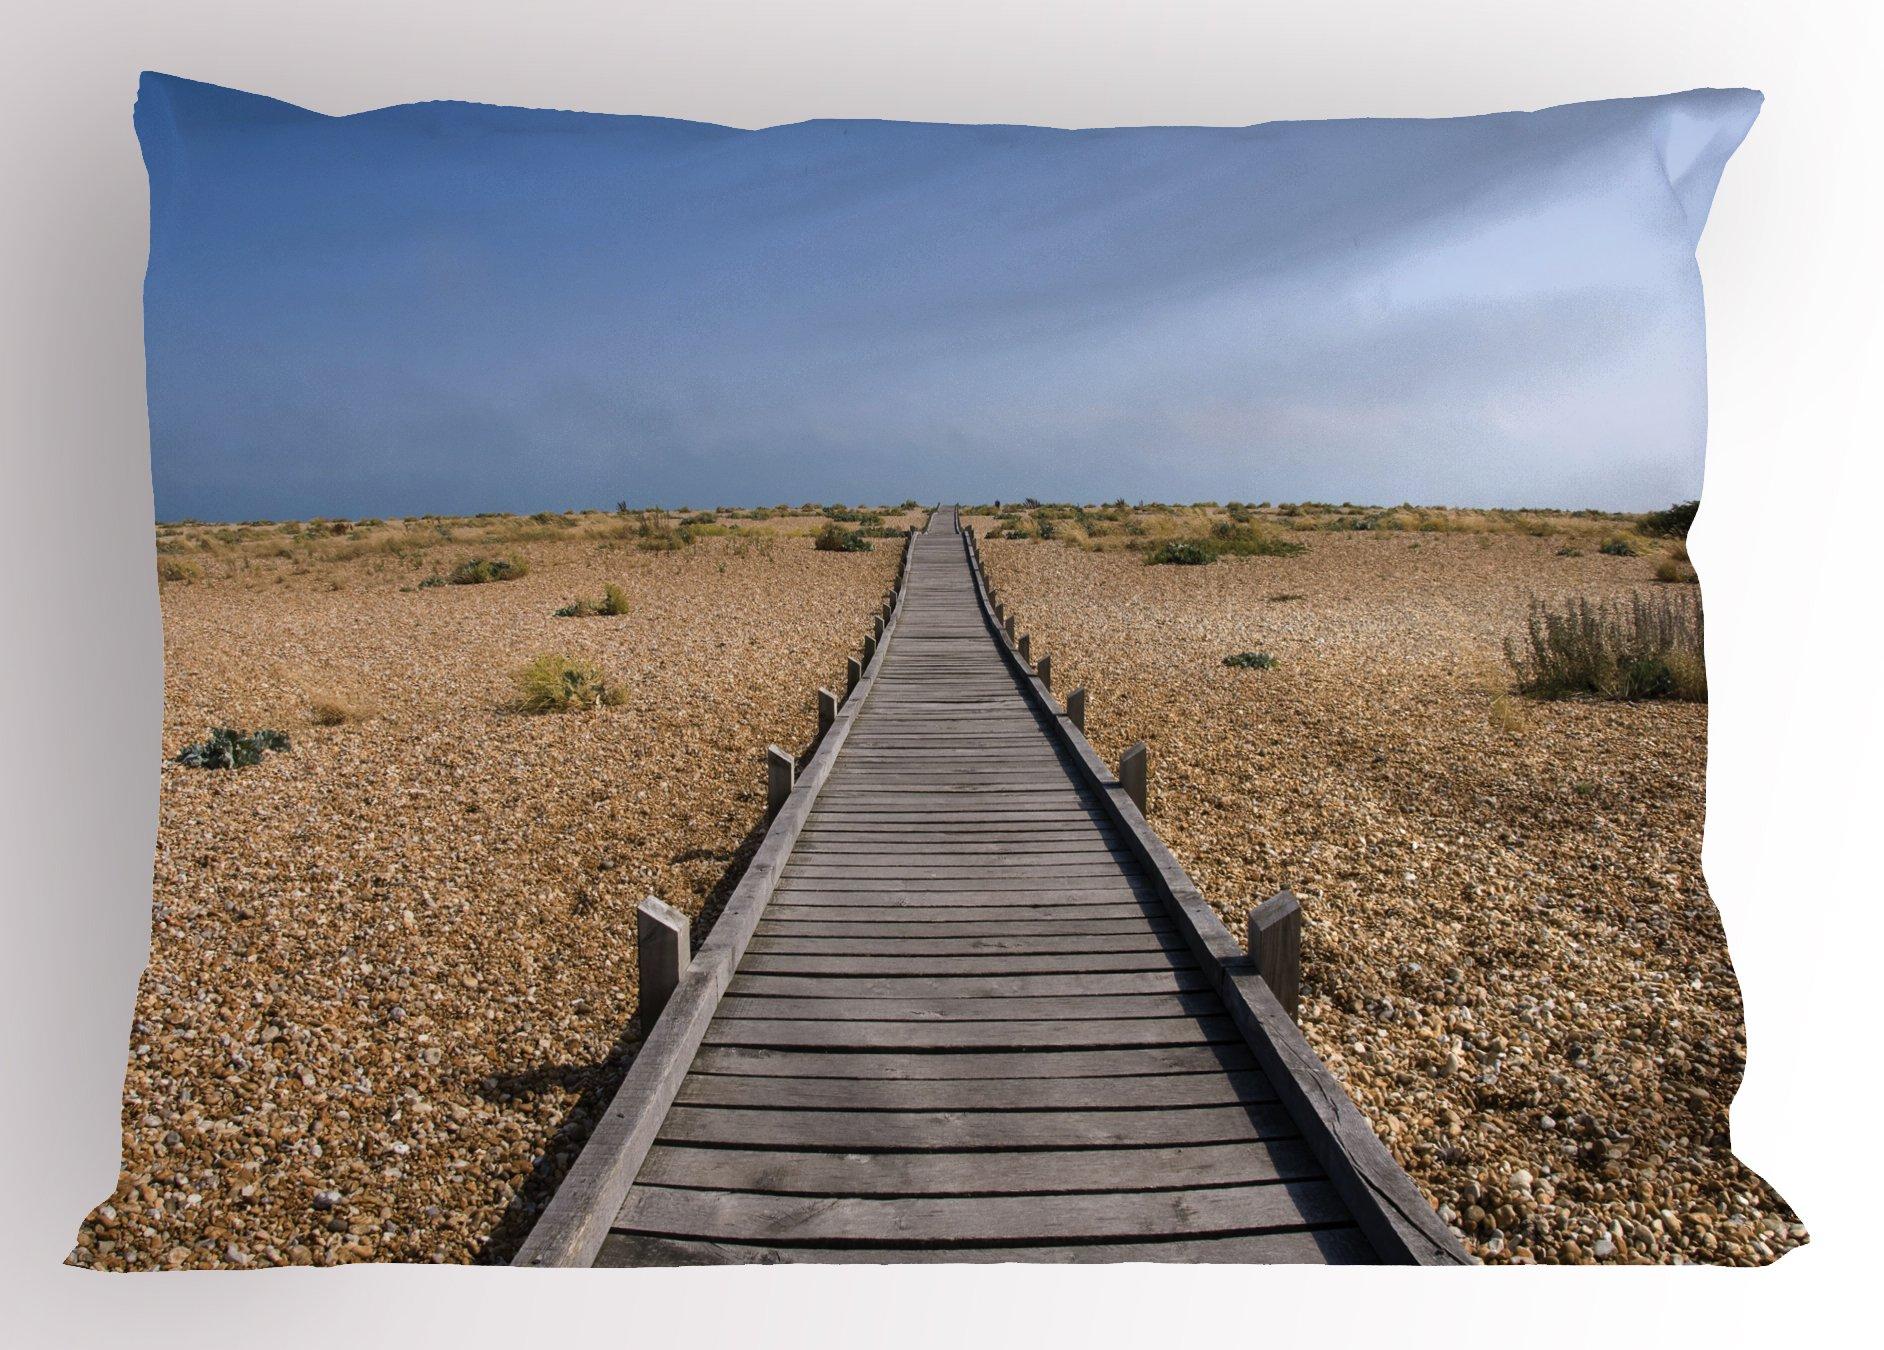 Lunarable Beach Pillow Sham, Raised Wood Boardwalk Across a Pebble Coastline Stone Endless Road Nature Theme, Decorative Standard King Size Printed Pillowcase, 36 X 20 inches, Blue Brown Cream by Lunarable (Image #1)